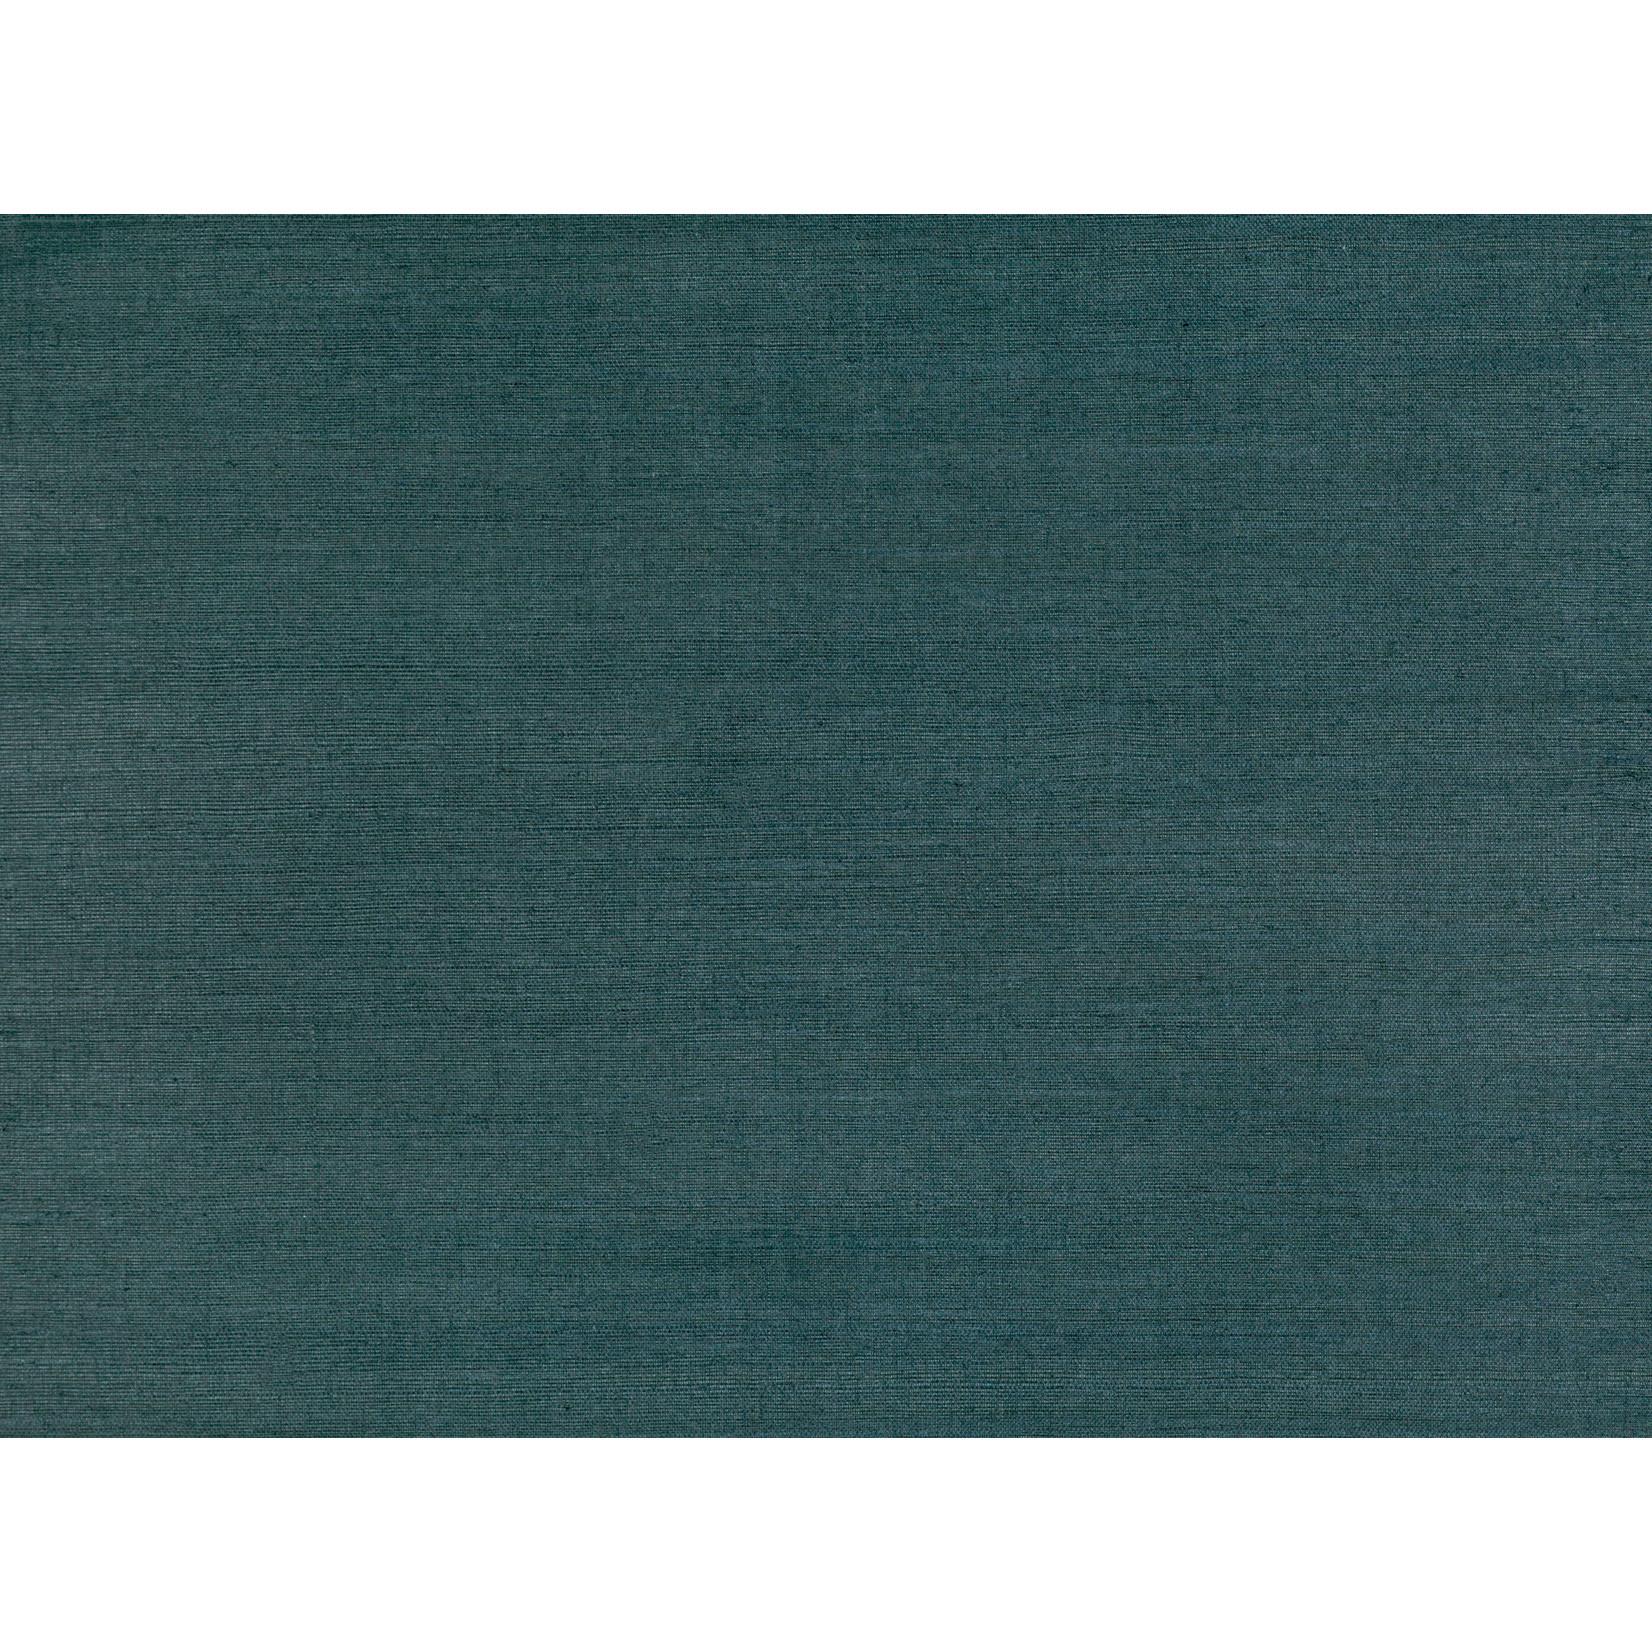 Mark Alexander Grasscloth Handwoven Wallcoverings   Sisal Ocean